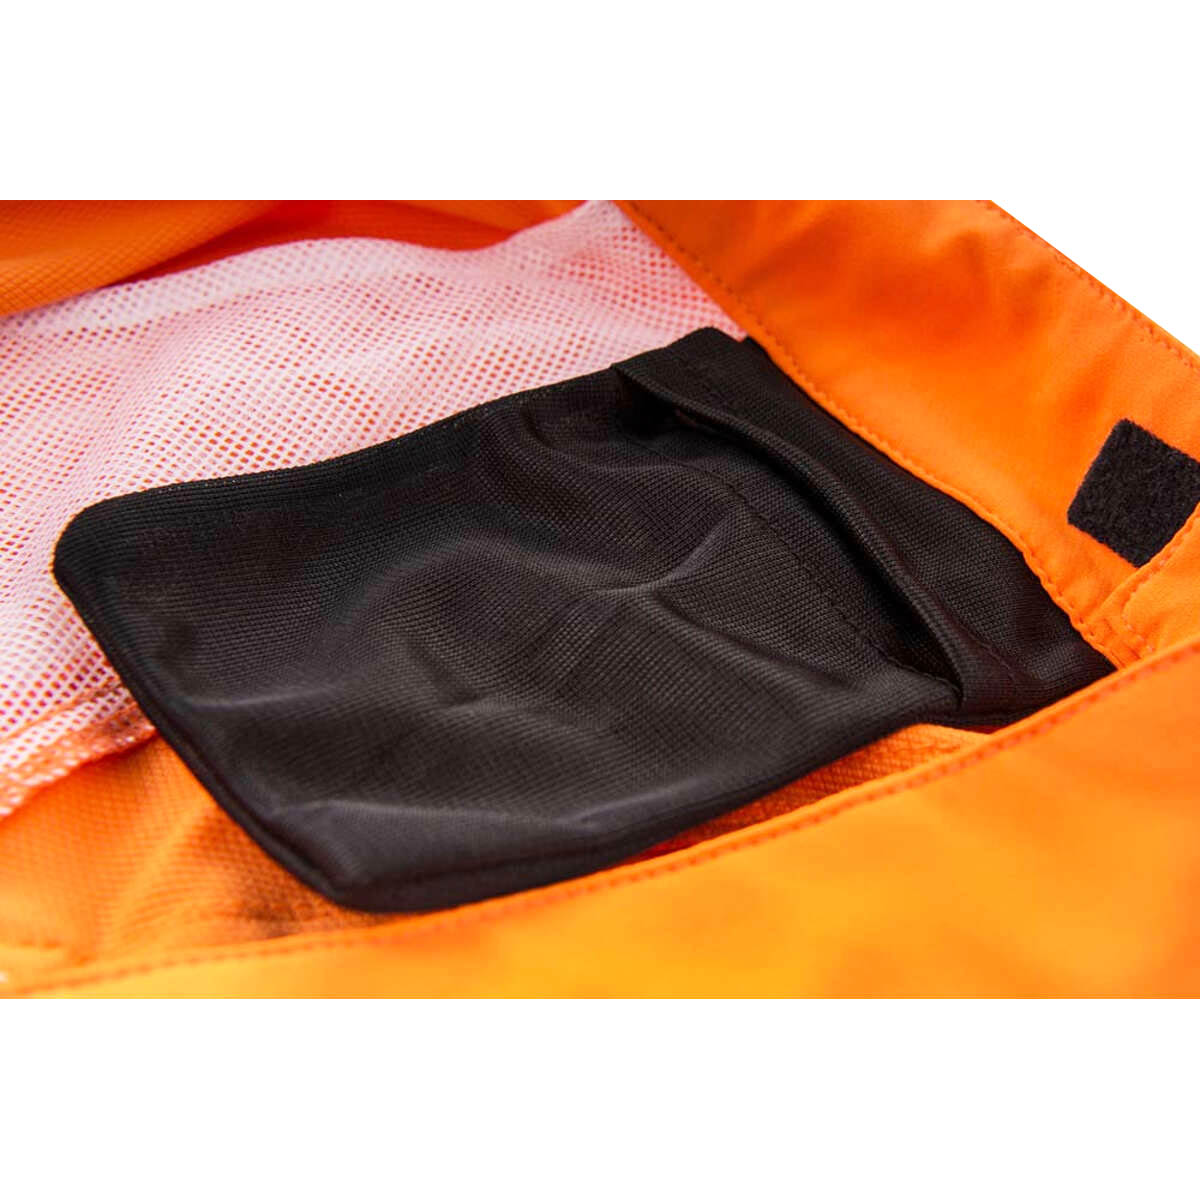 Fly Orange Racing Downhill-Short Ripa Orange Fly ad5466